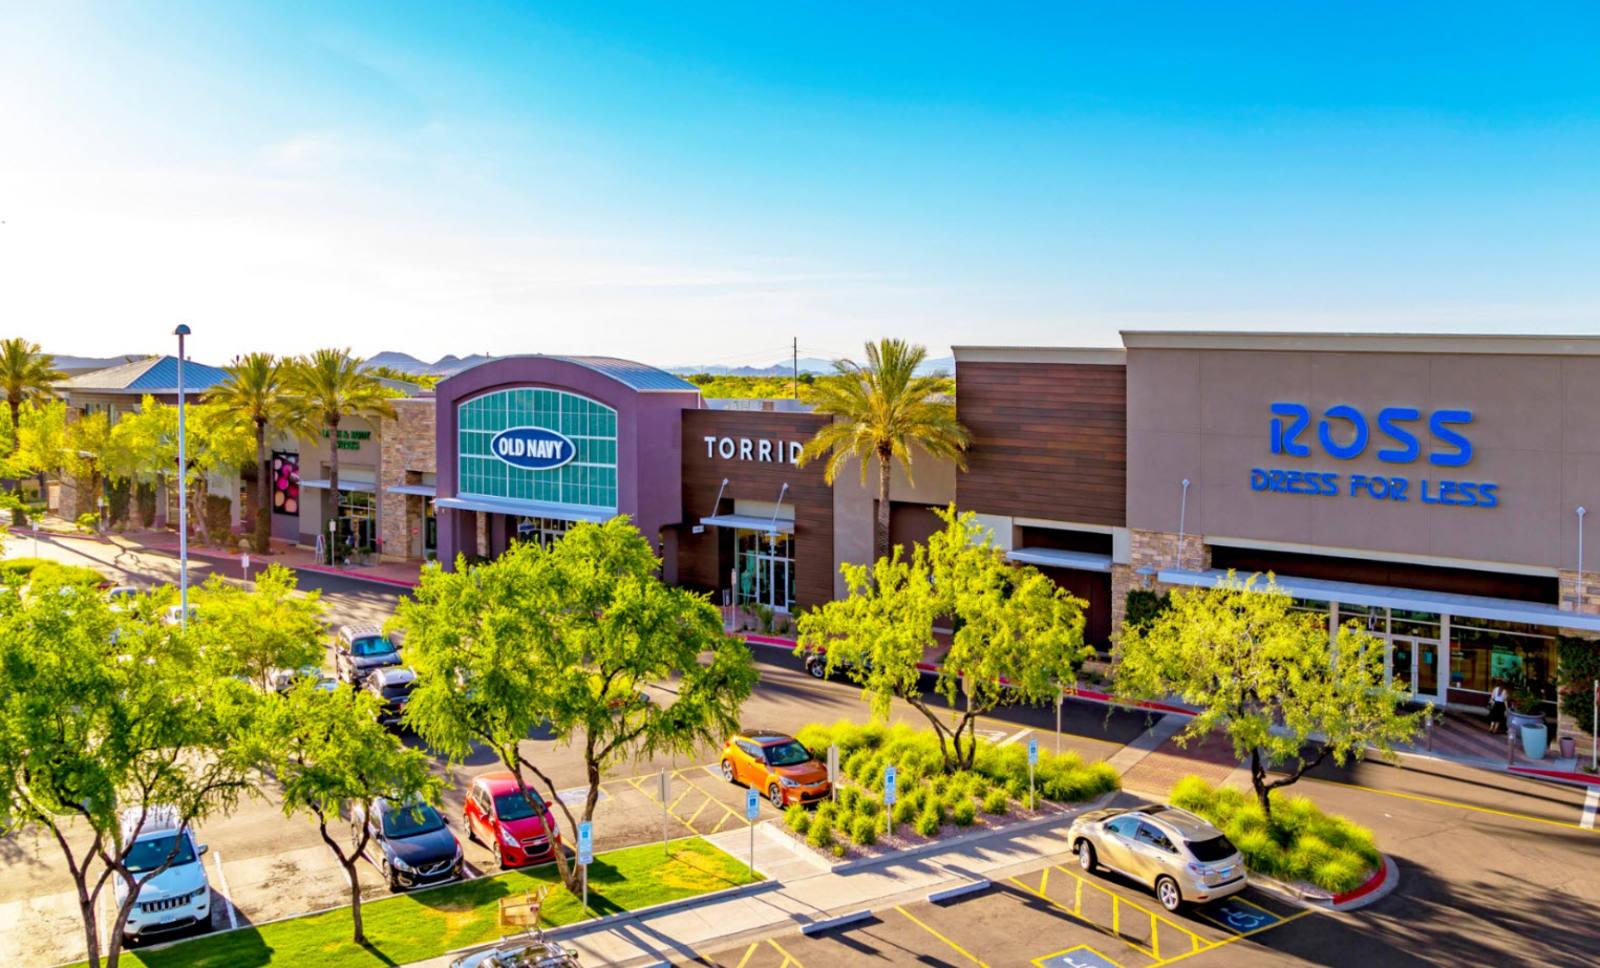 desert ridge mall map Vestar A Shopping Center Company Portfolio desert ridge mall map